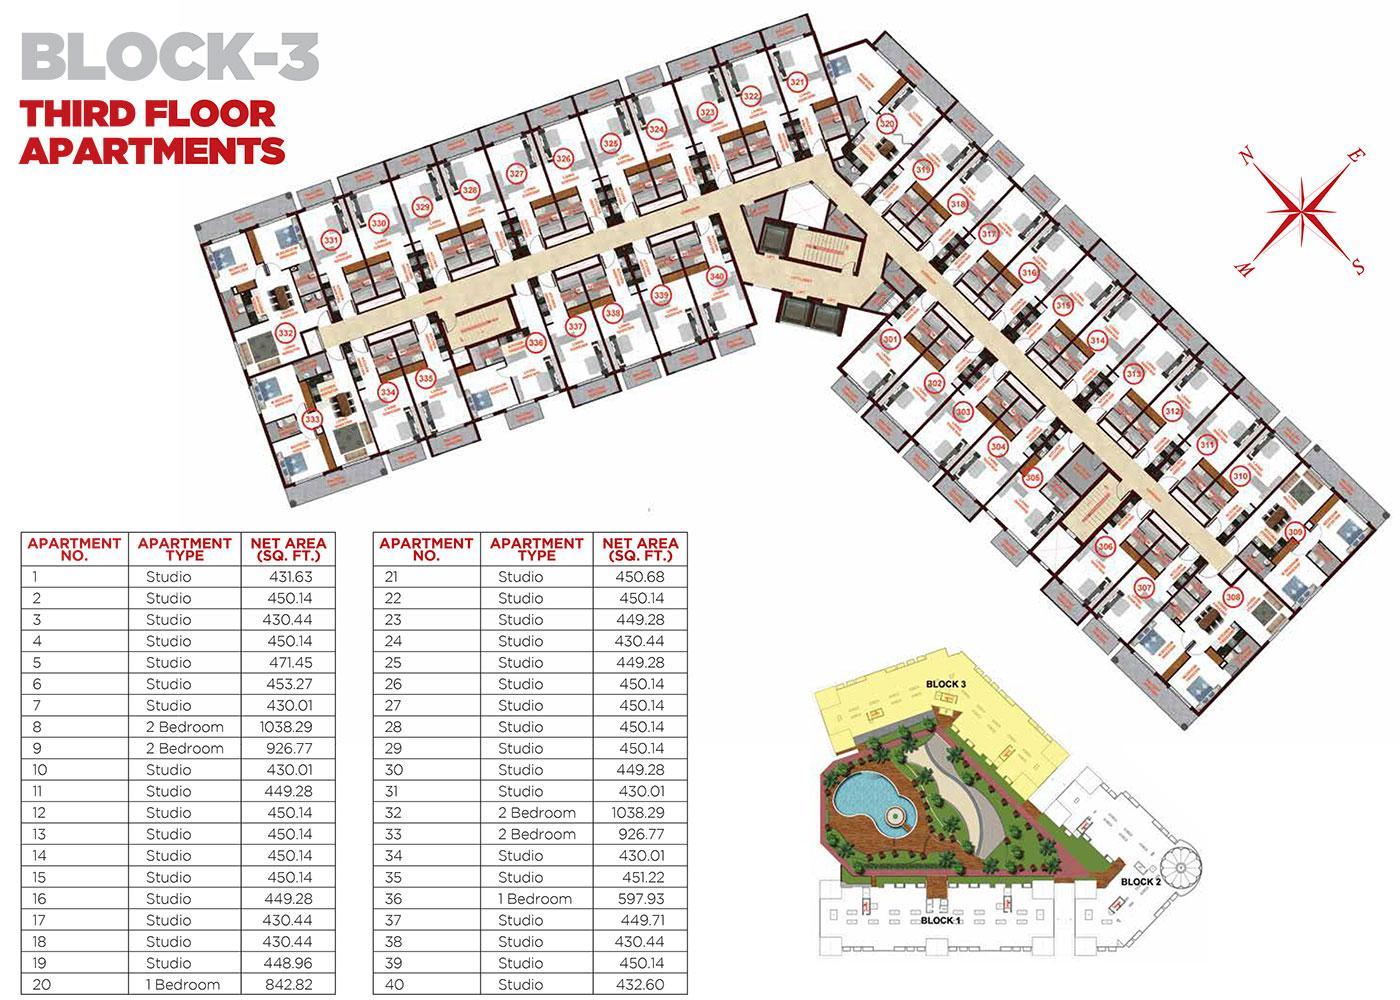 Third Floor Apartments Block 3